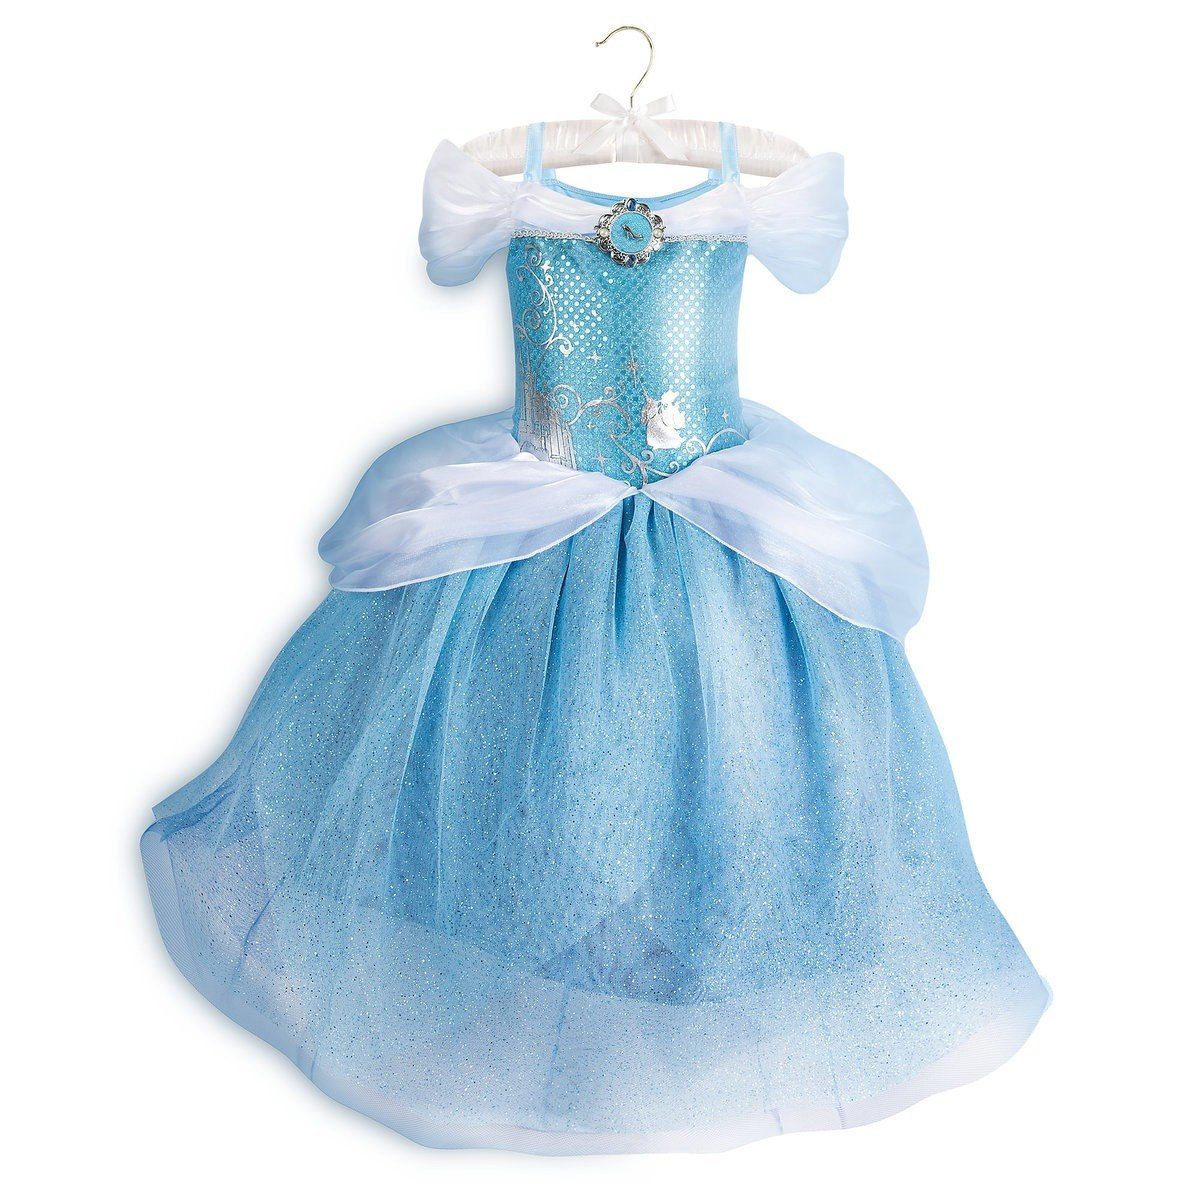 Vestido Princesa Cenicienta Princesa Disney Store 2018